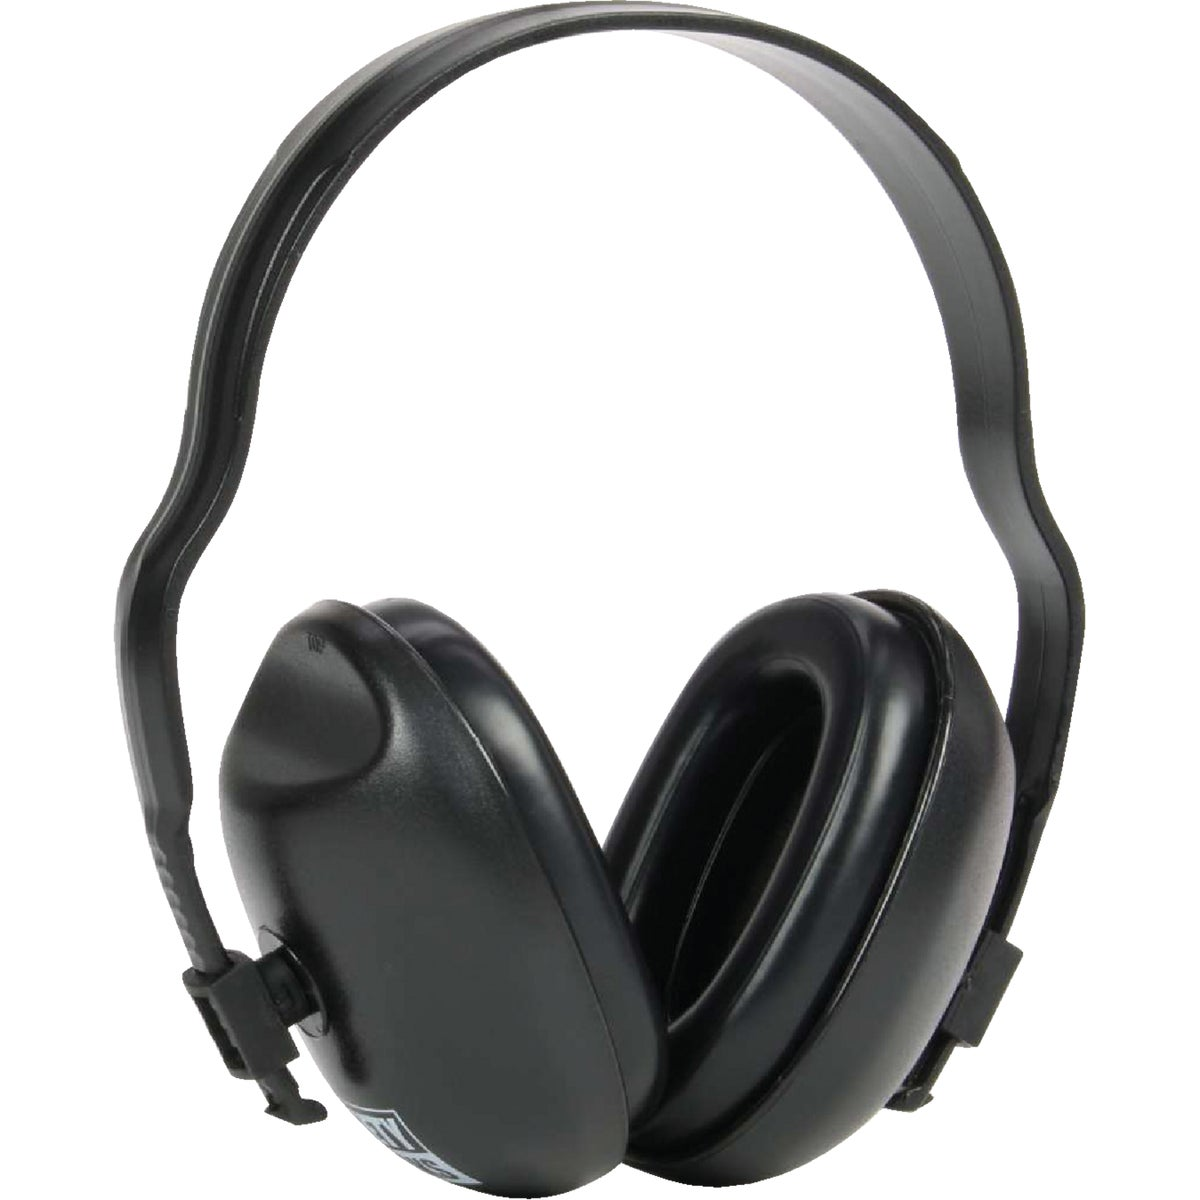 MSA Safety/InCom BASIC EARMUFFS 10004293